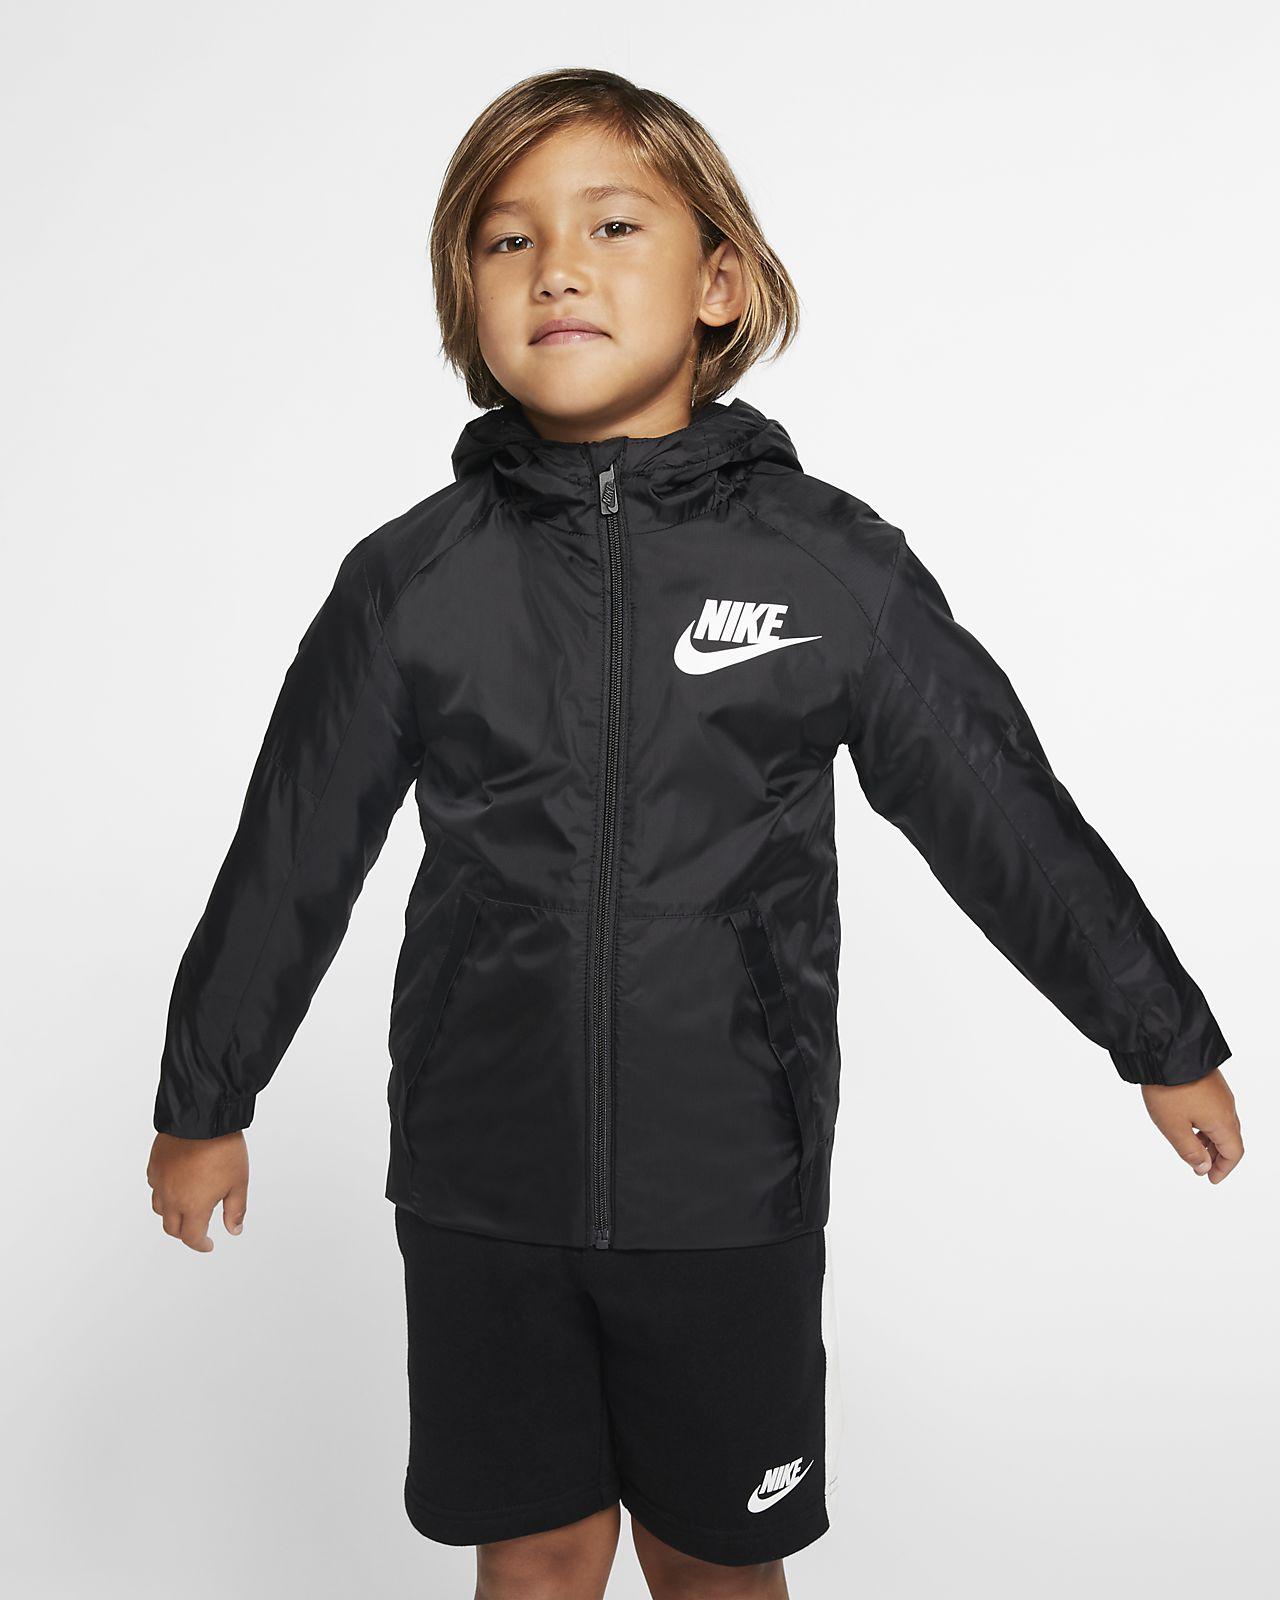 Giacca Nike Sportswear - Bambini